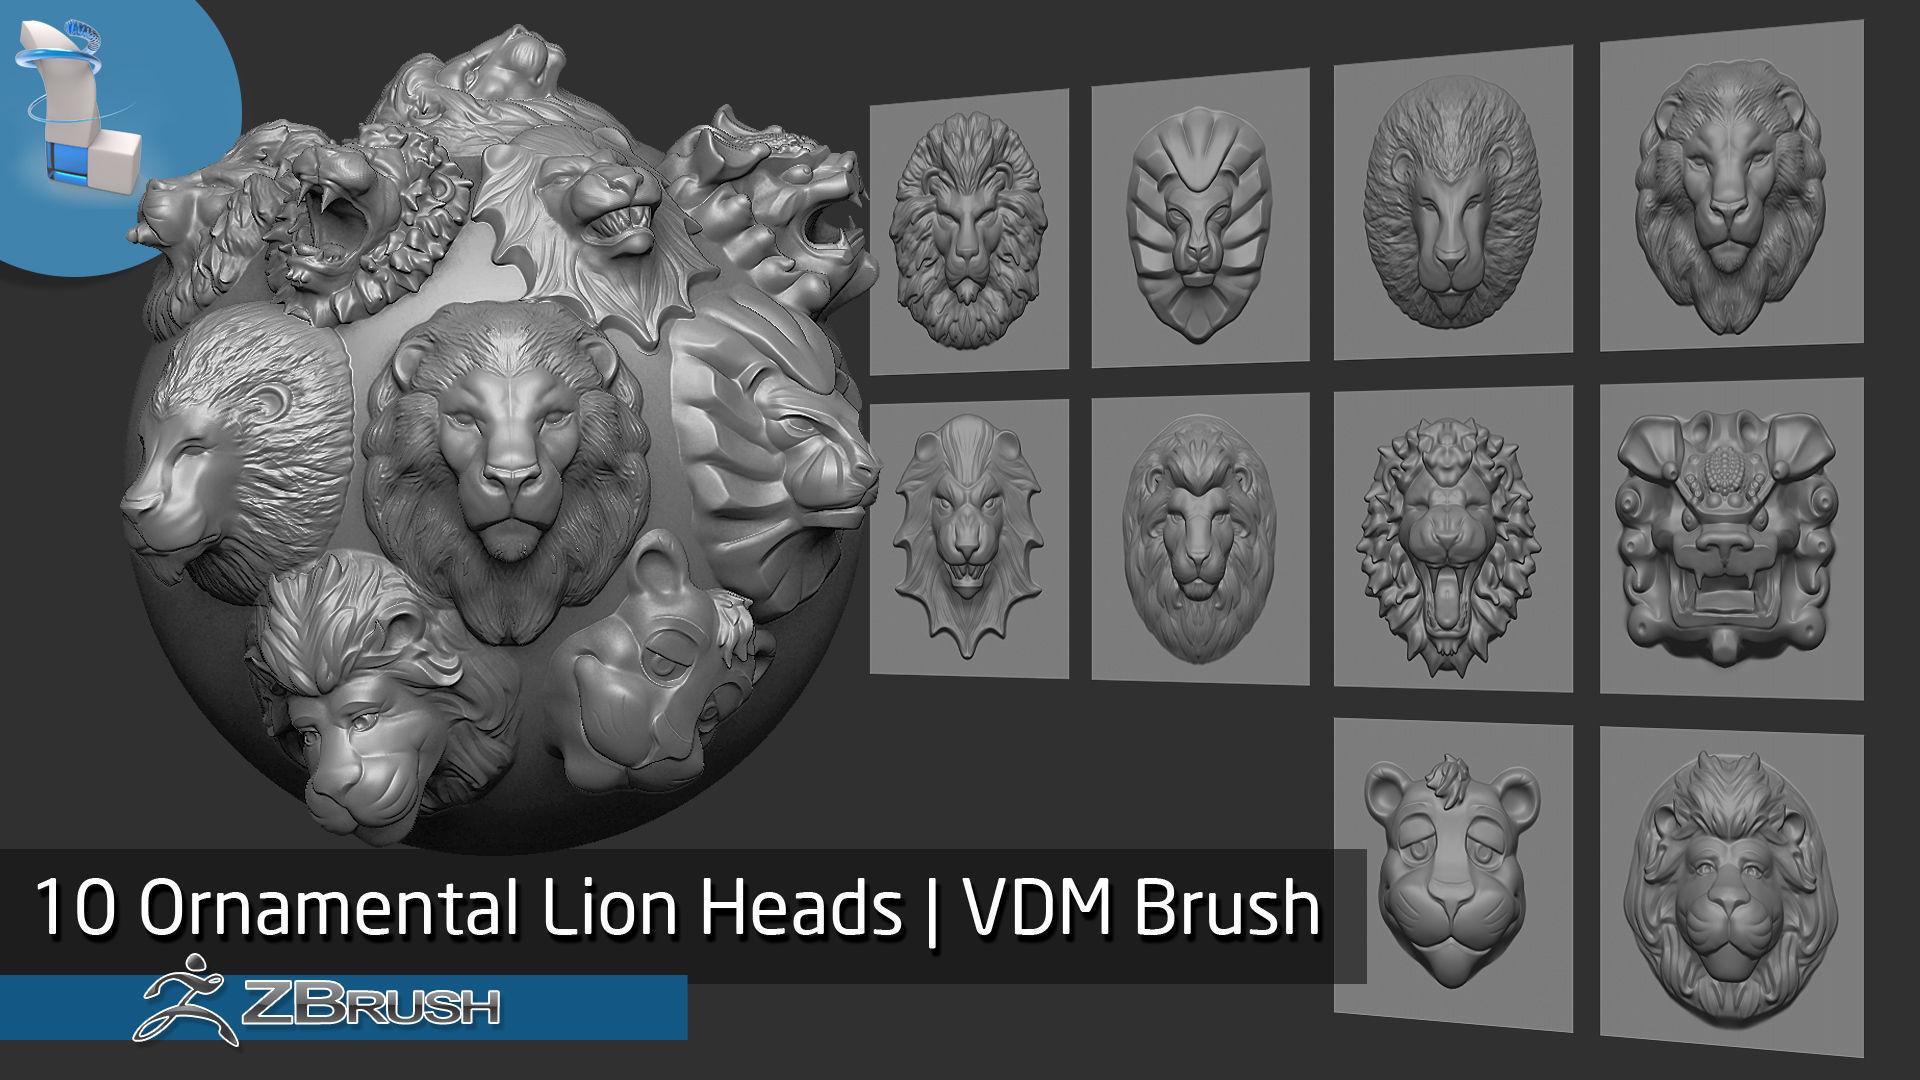 Zbrush - 10 Ornamental Lion Heads VDM Brush